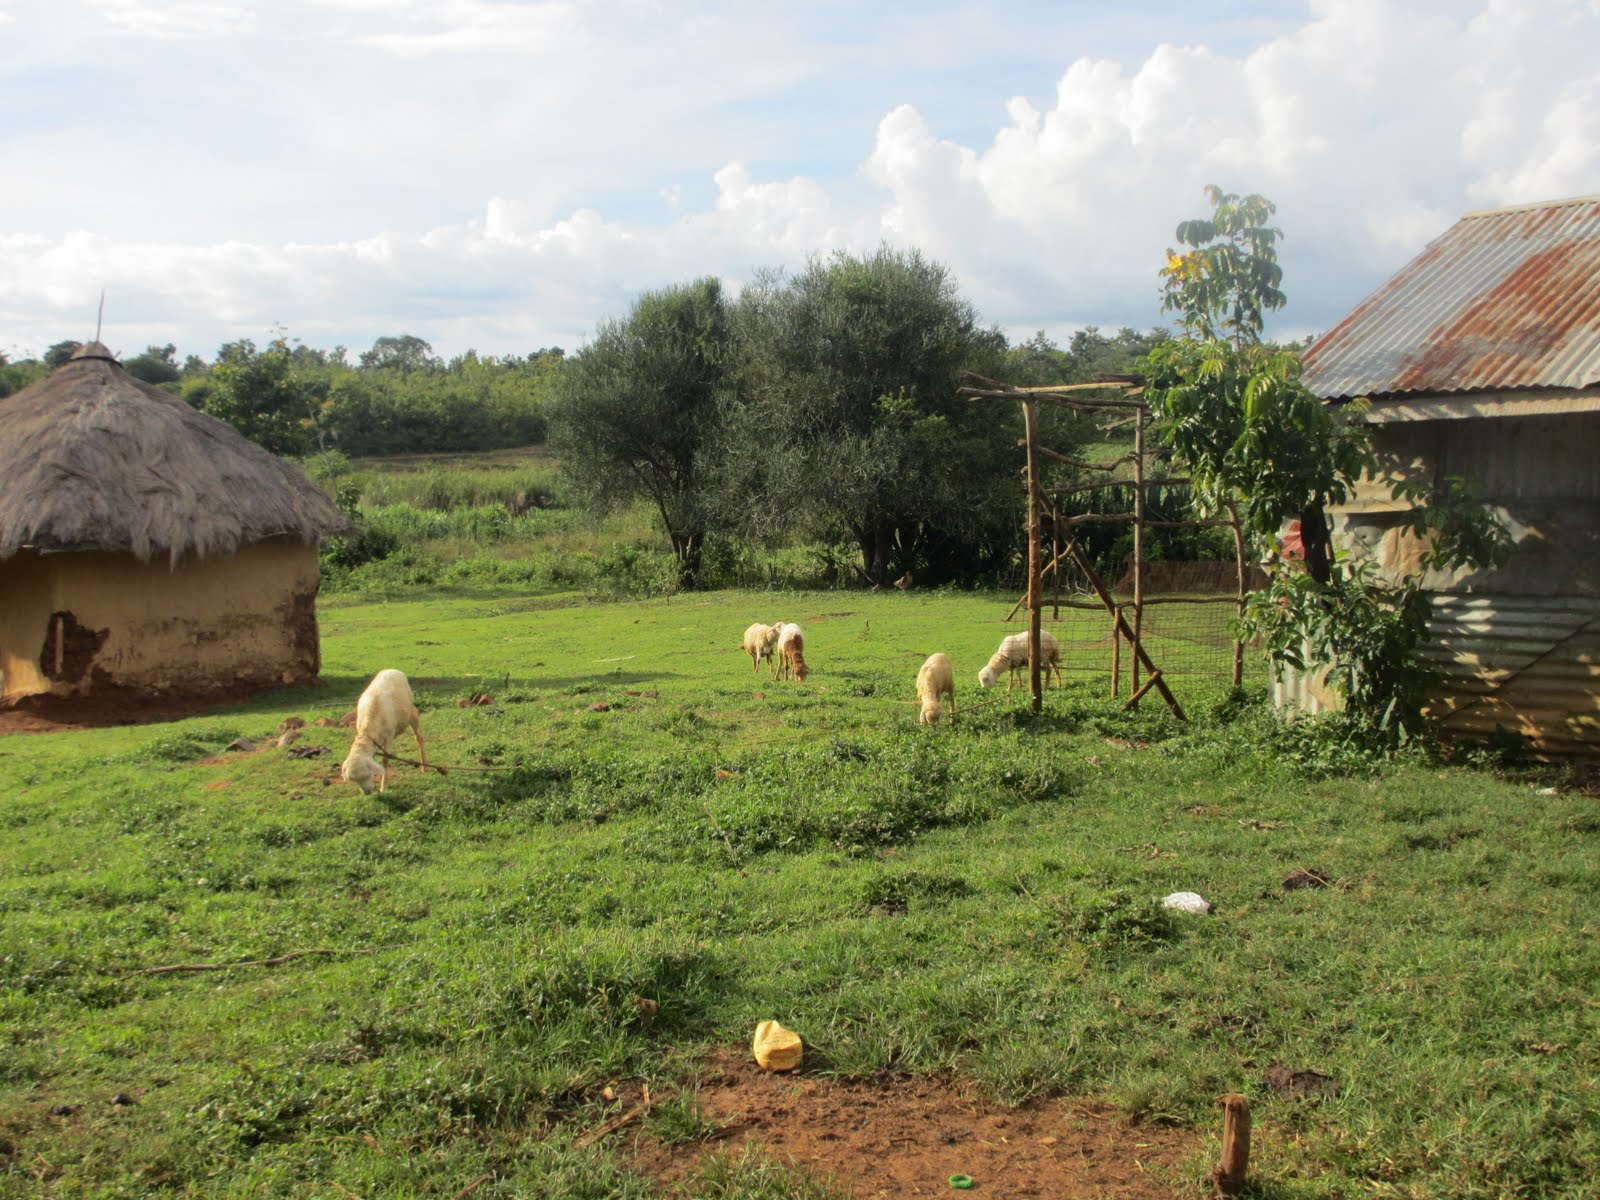 Photo: Livestock on compound of non-recipient household